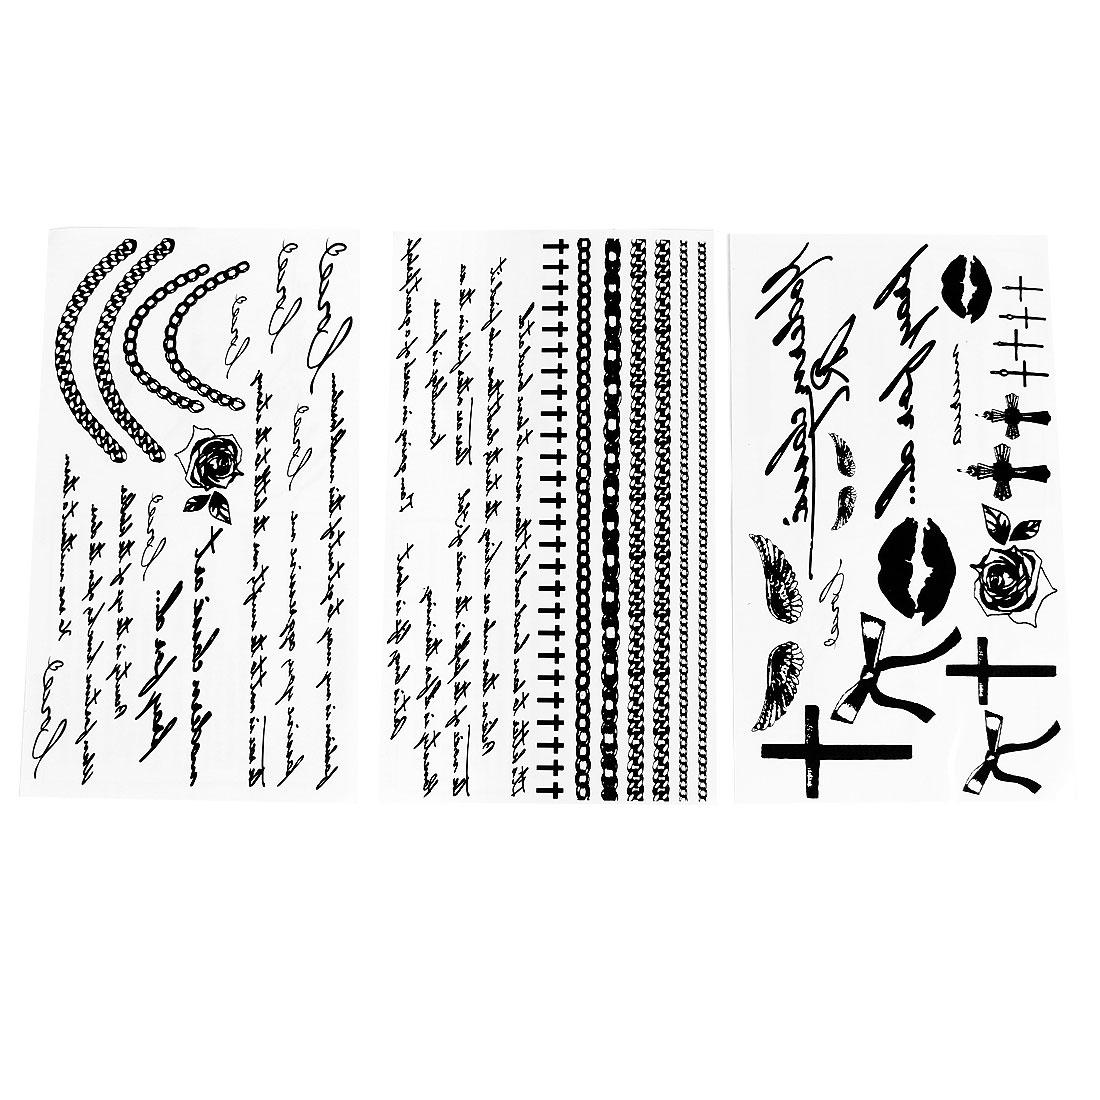 Black Bracelet Wordage Cross Bowknot Pattern Transfer Tattoos Stickers 3 Pcs